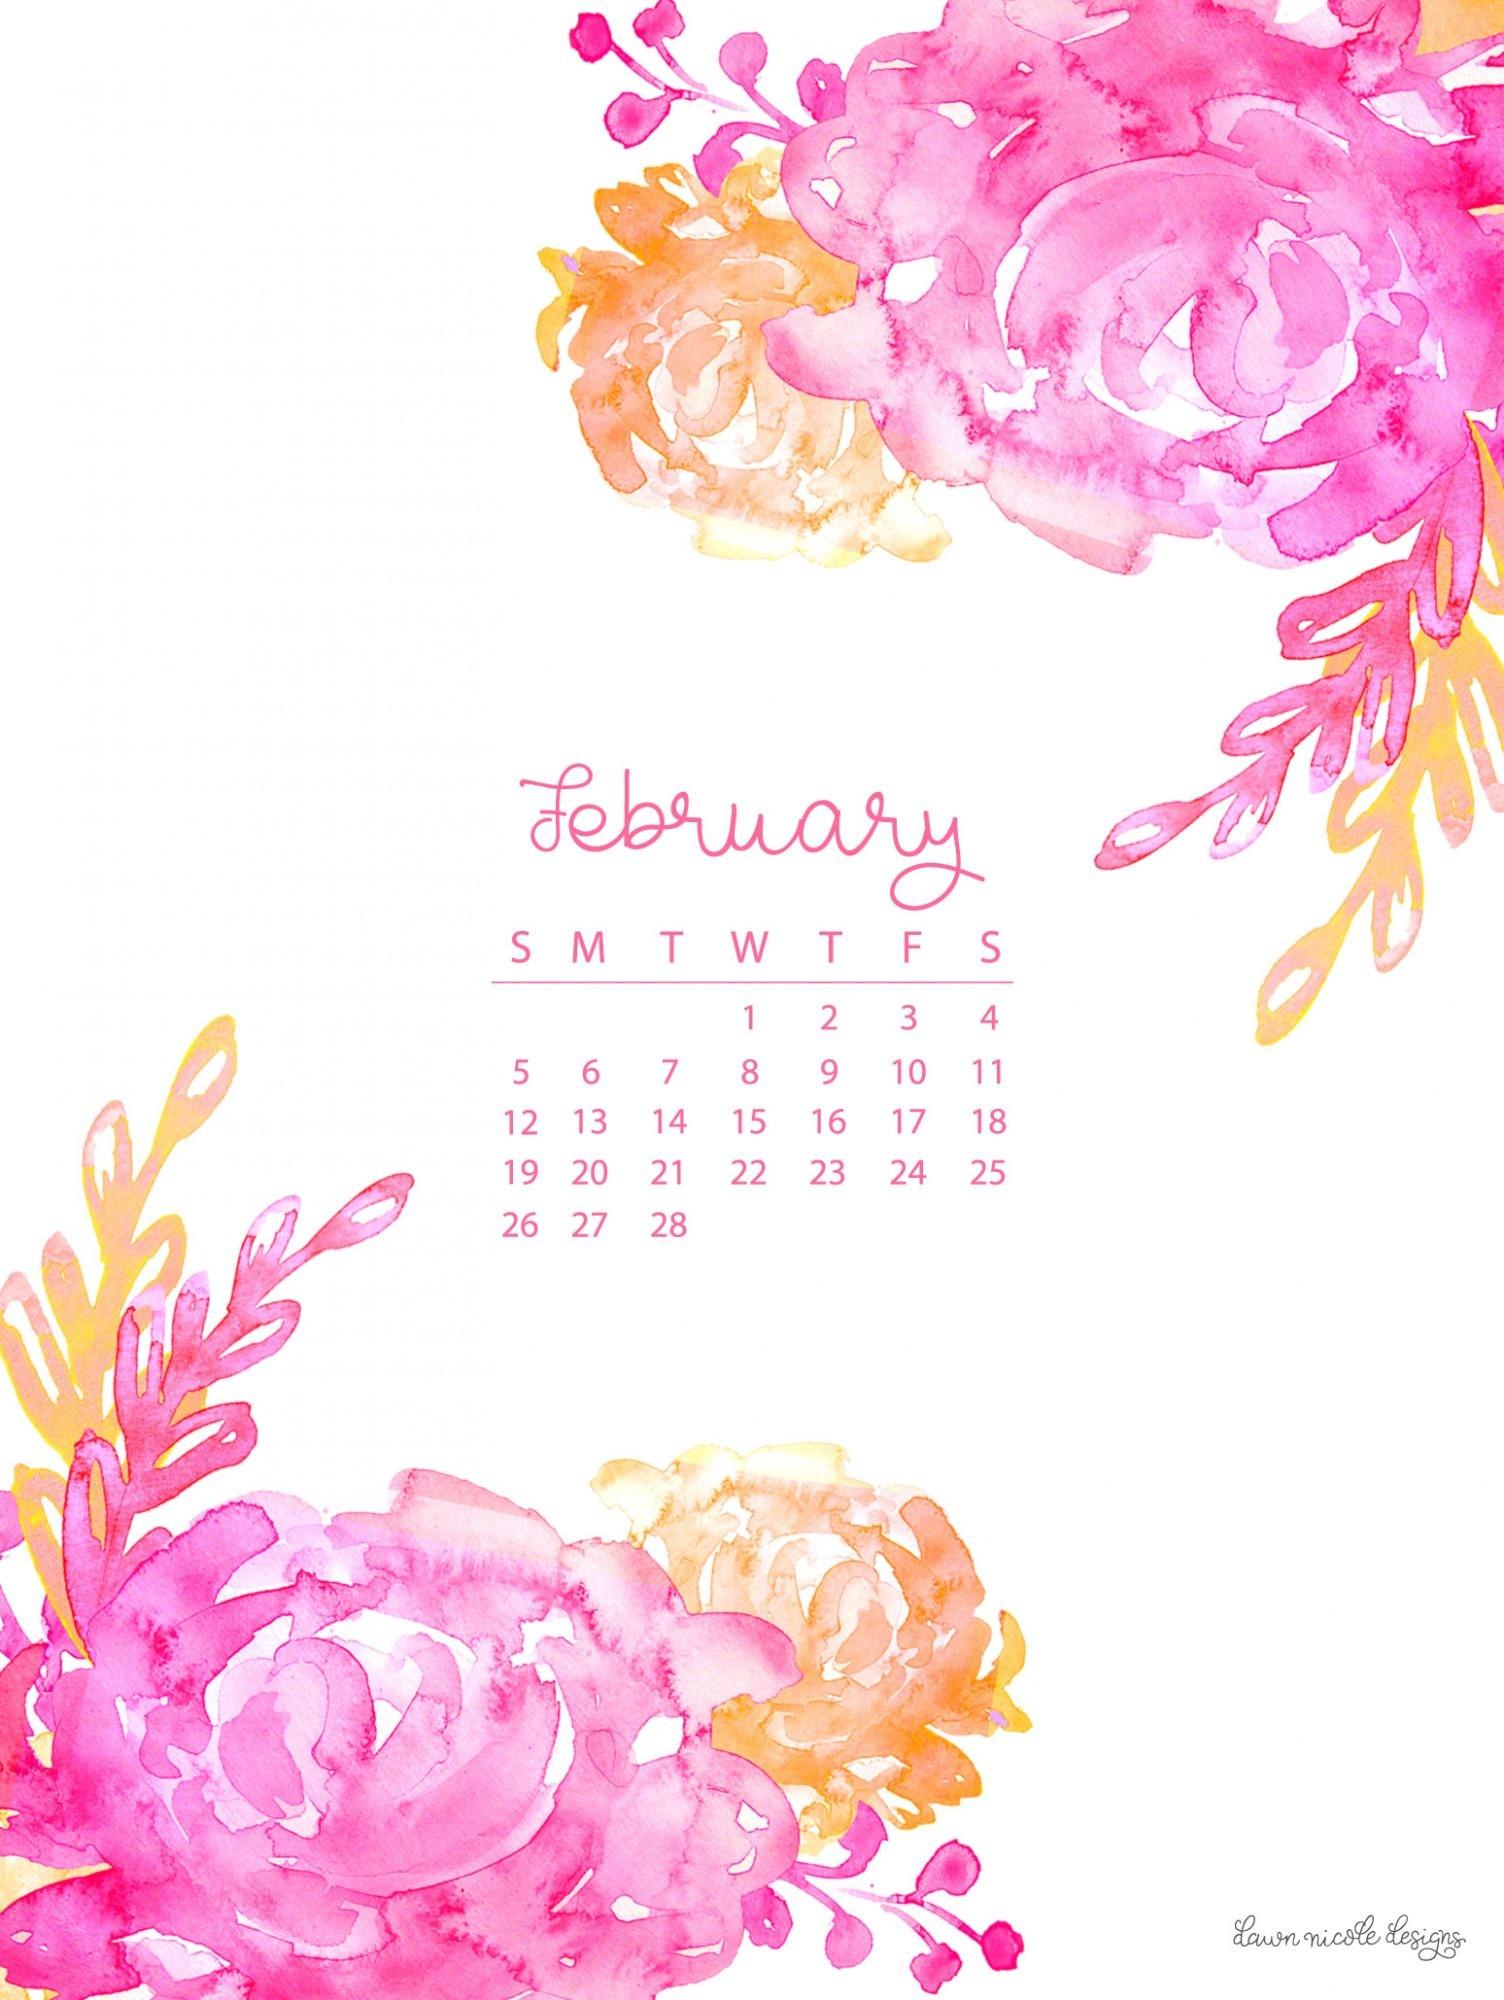 February 2018 Wallpaper Calendar 63 images 1504x2000